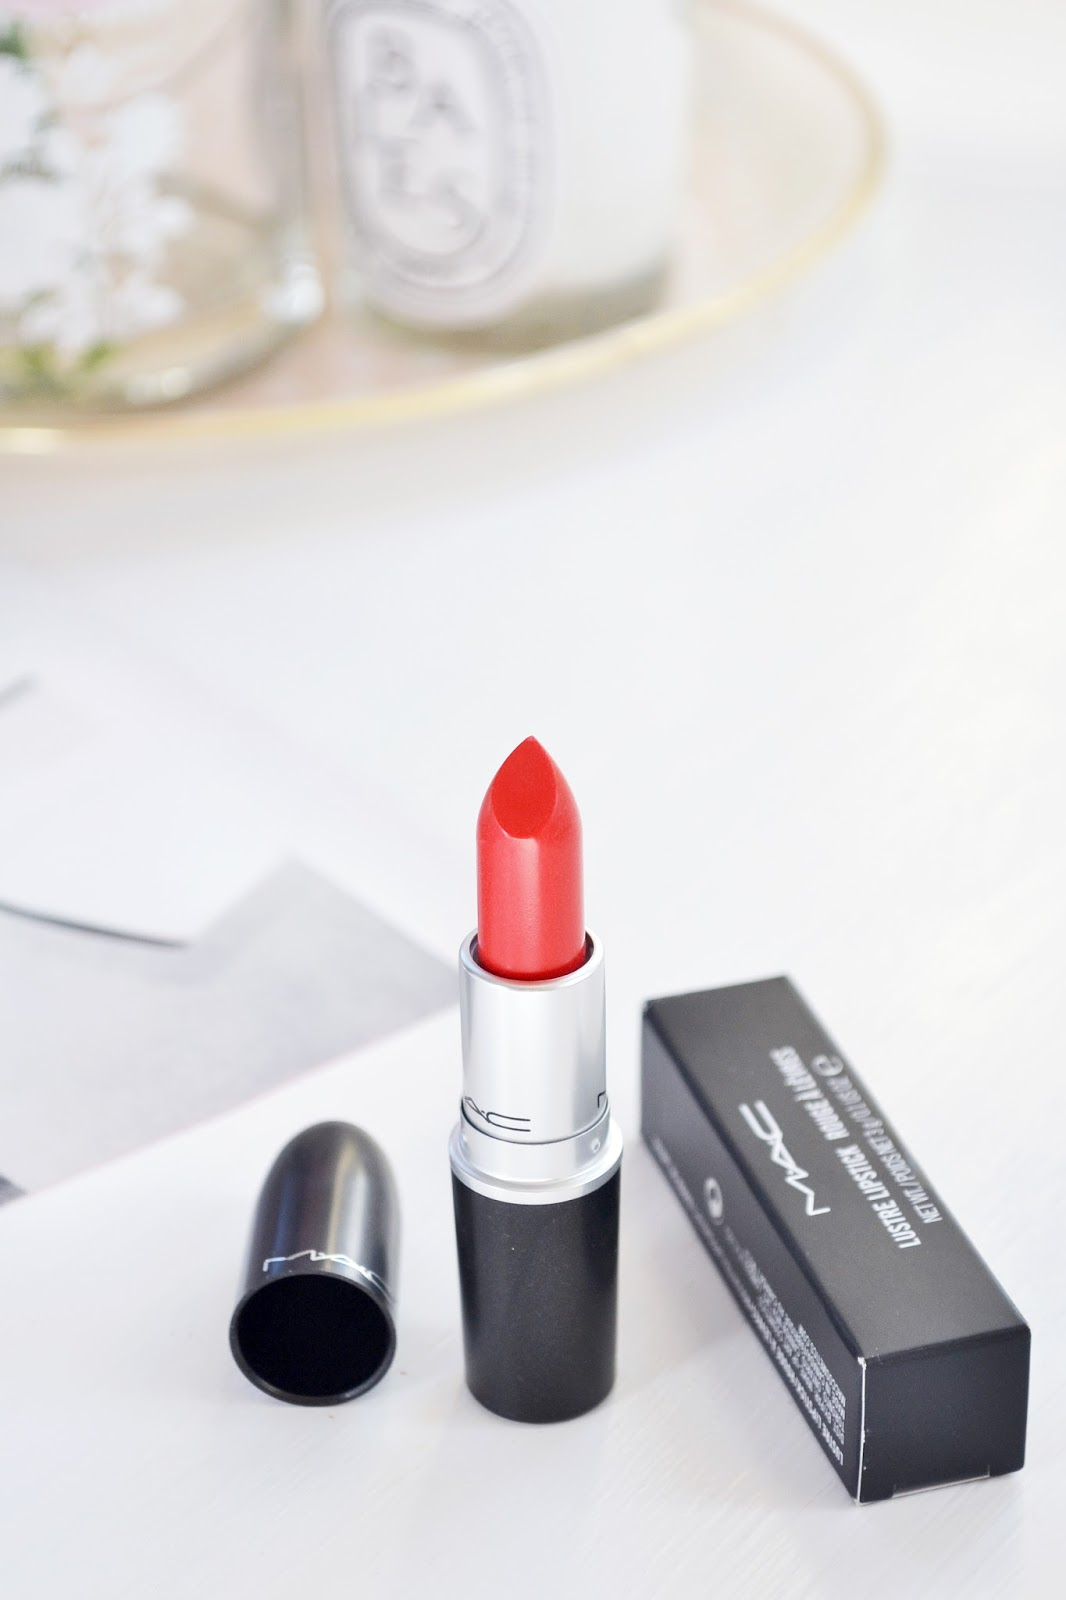 Mac 5 Alarm lipstick review